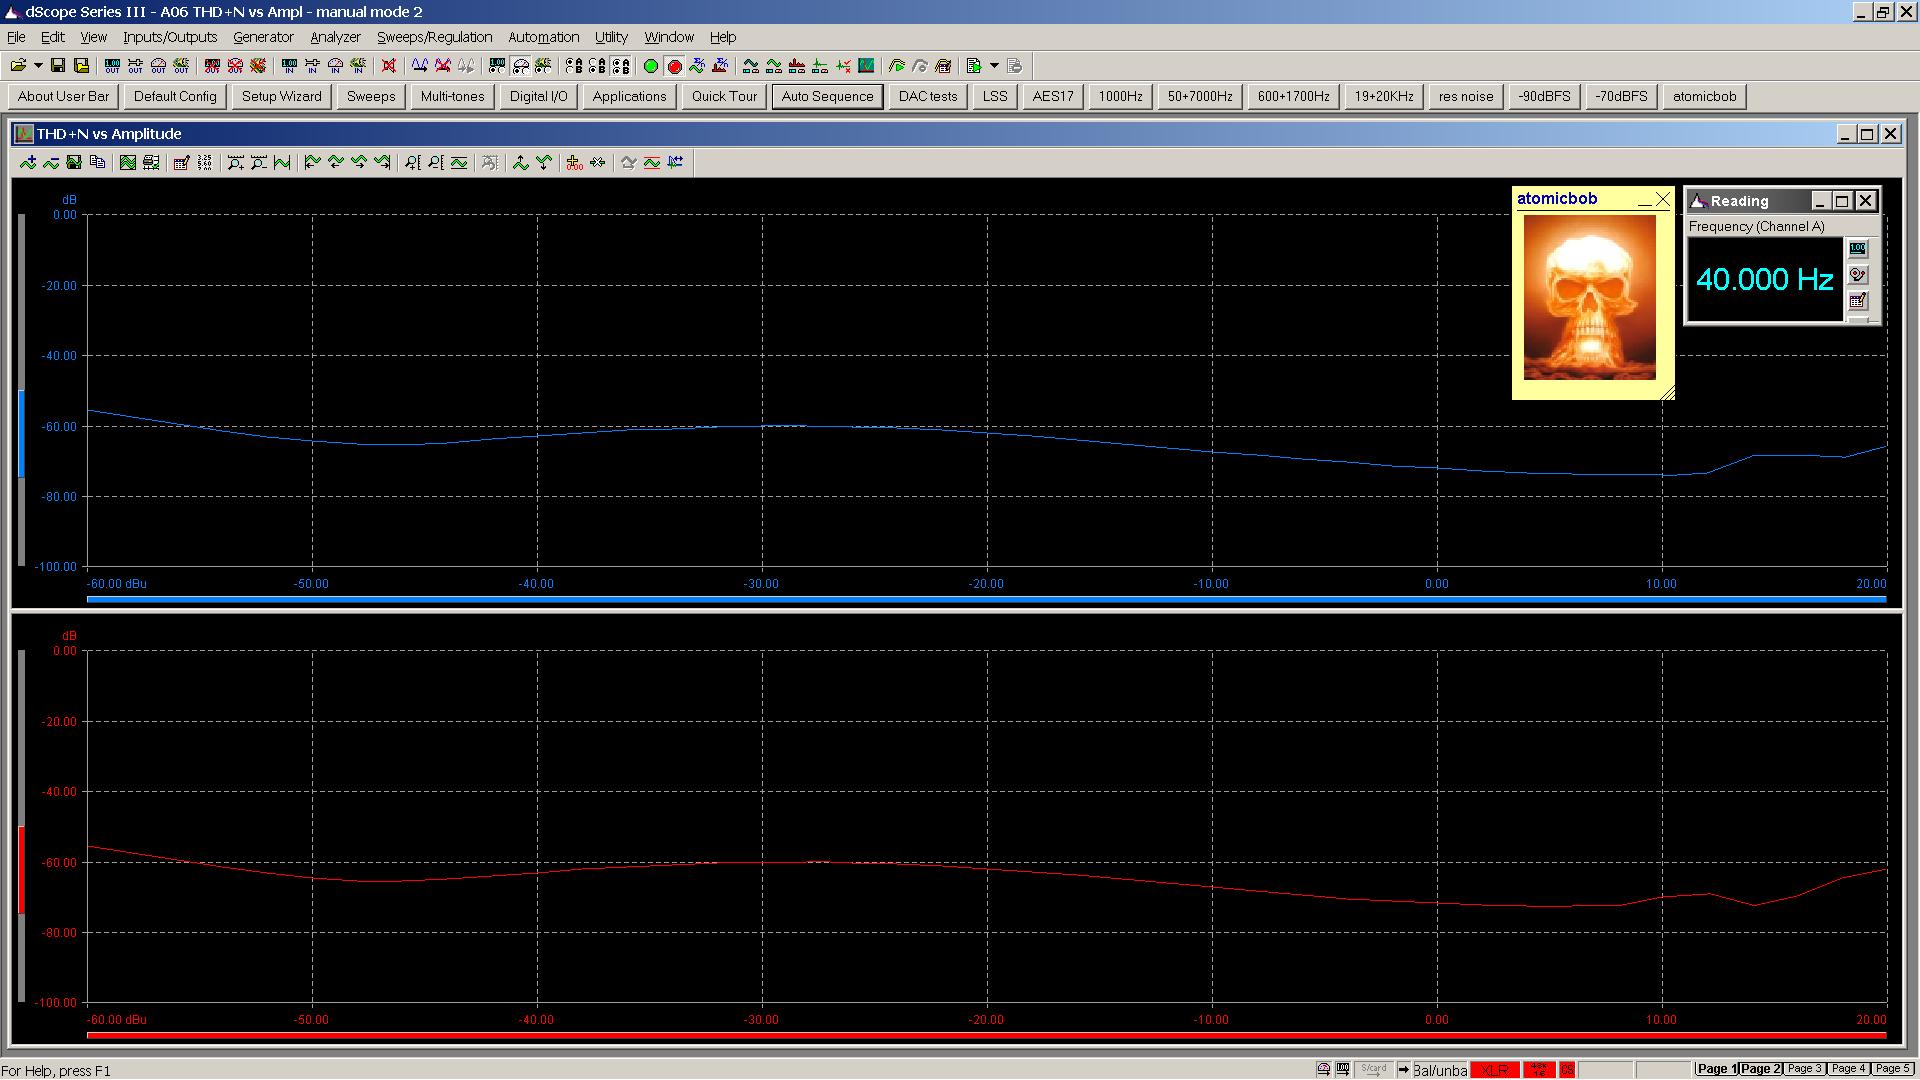 20181030 ISO Twin 40 Hz THD+N vs Amplitude 100K - v2.png